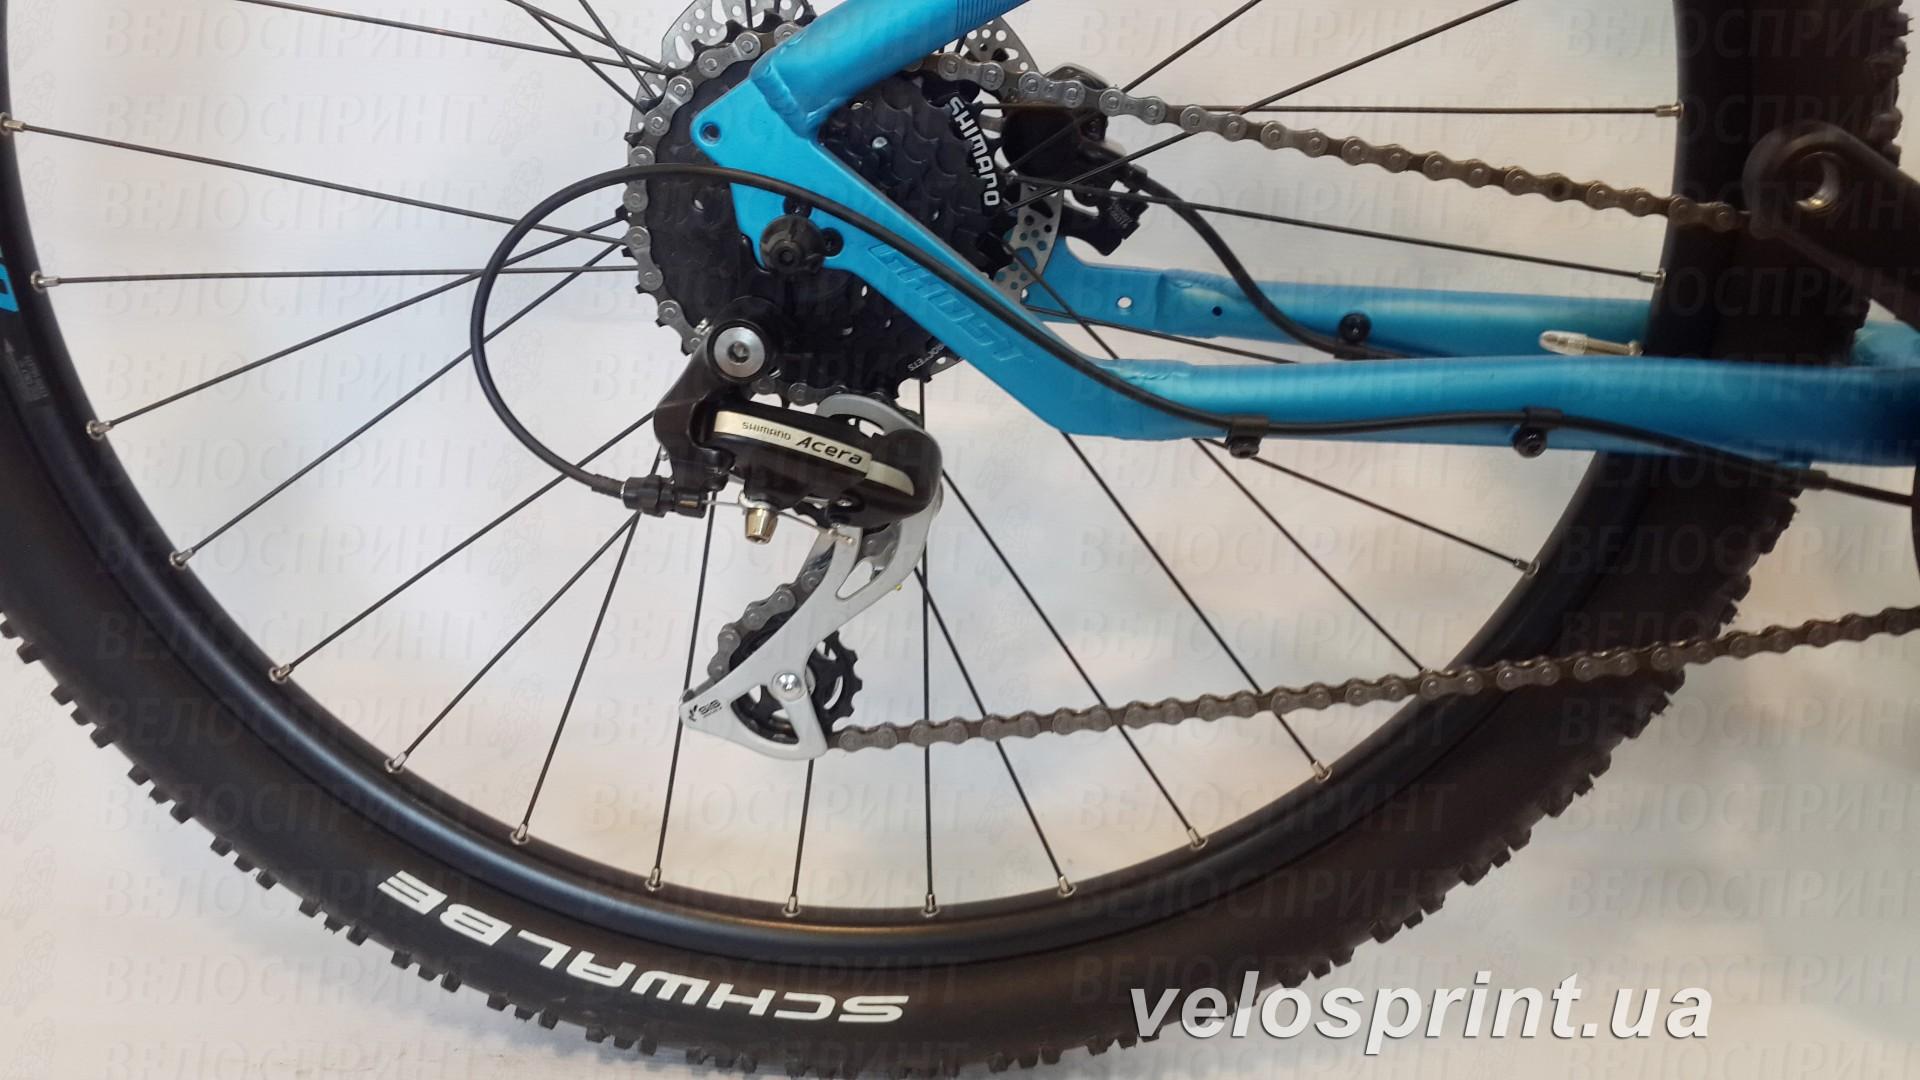 Велосипед GHOST Kato 2 blue/darkblue/black задний переключатель год 2016